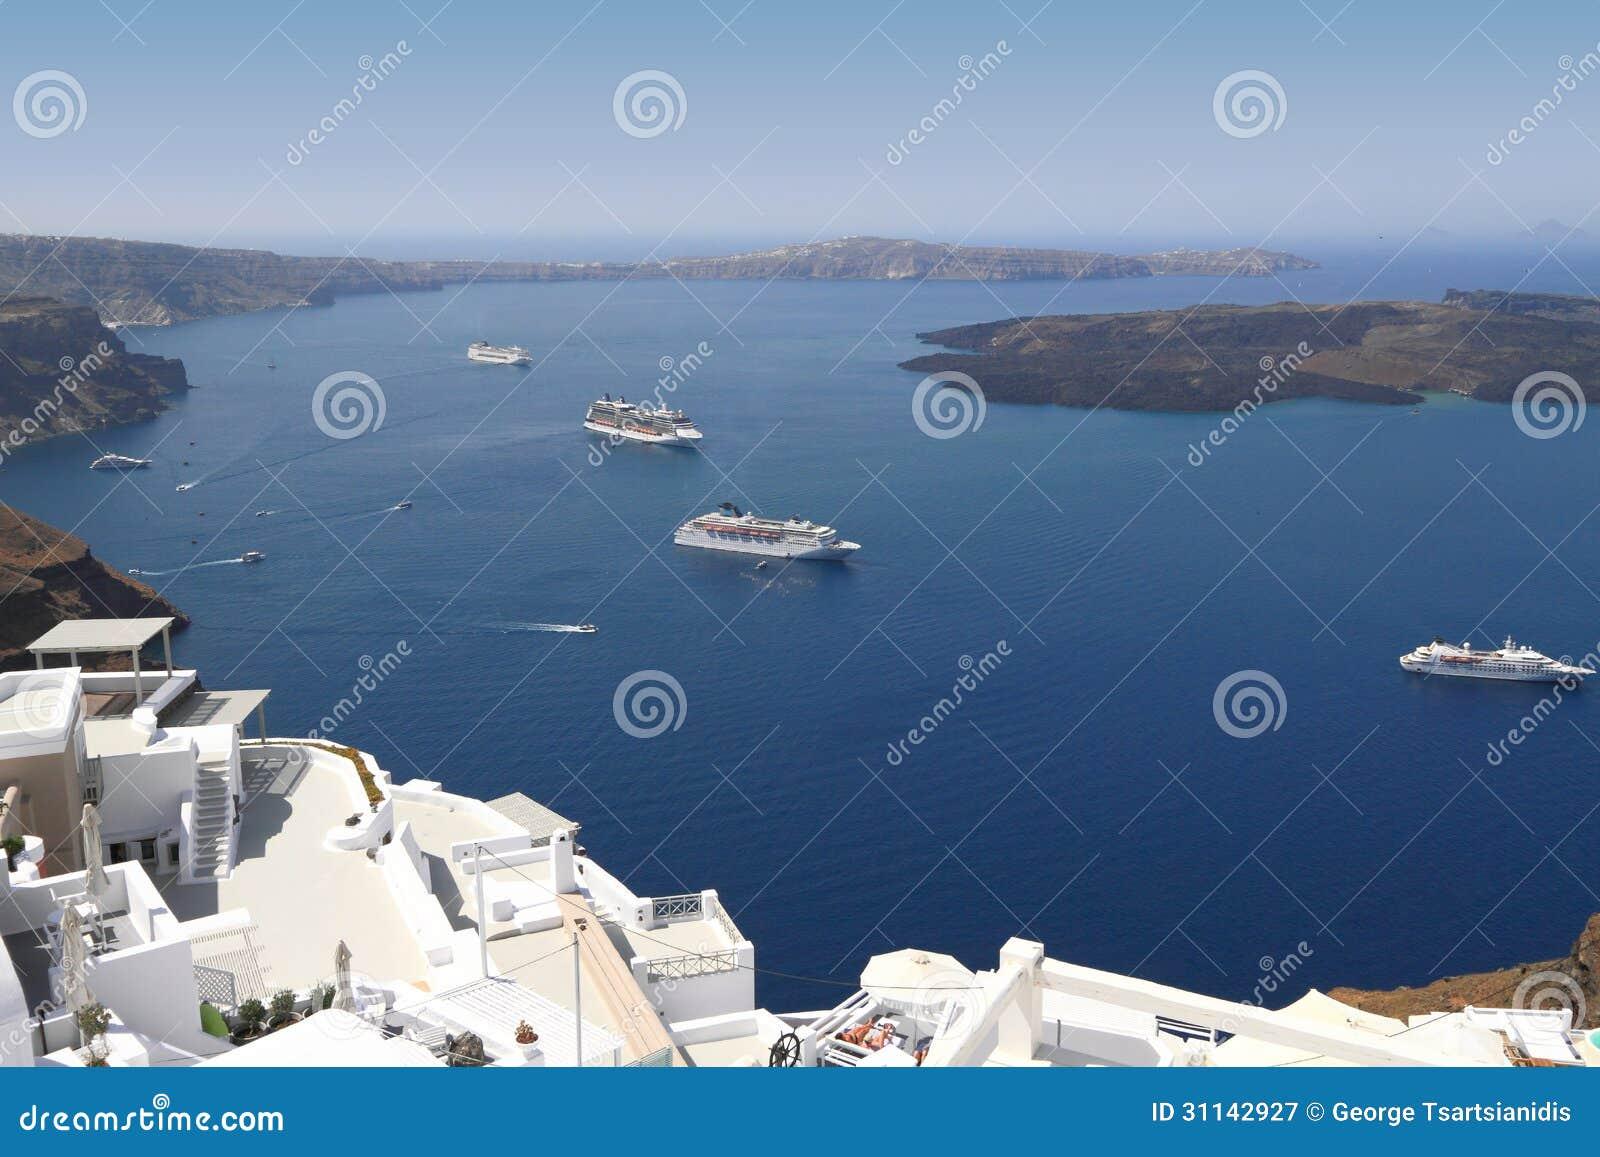 Cruise ships on Mediterranean sea in Santorini